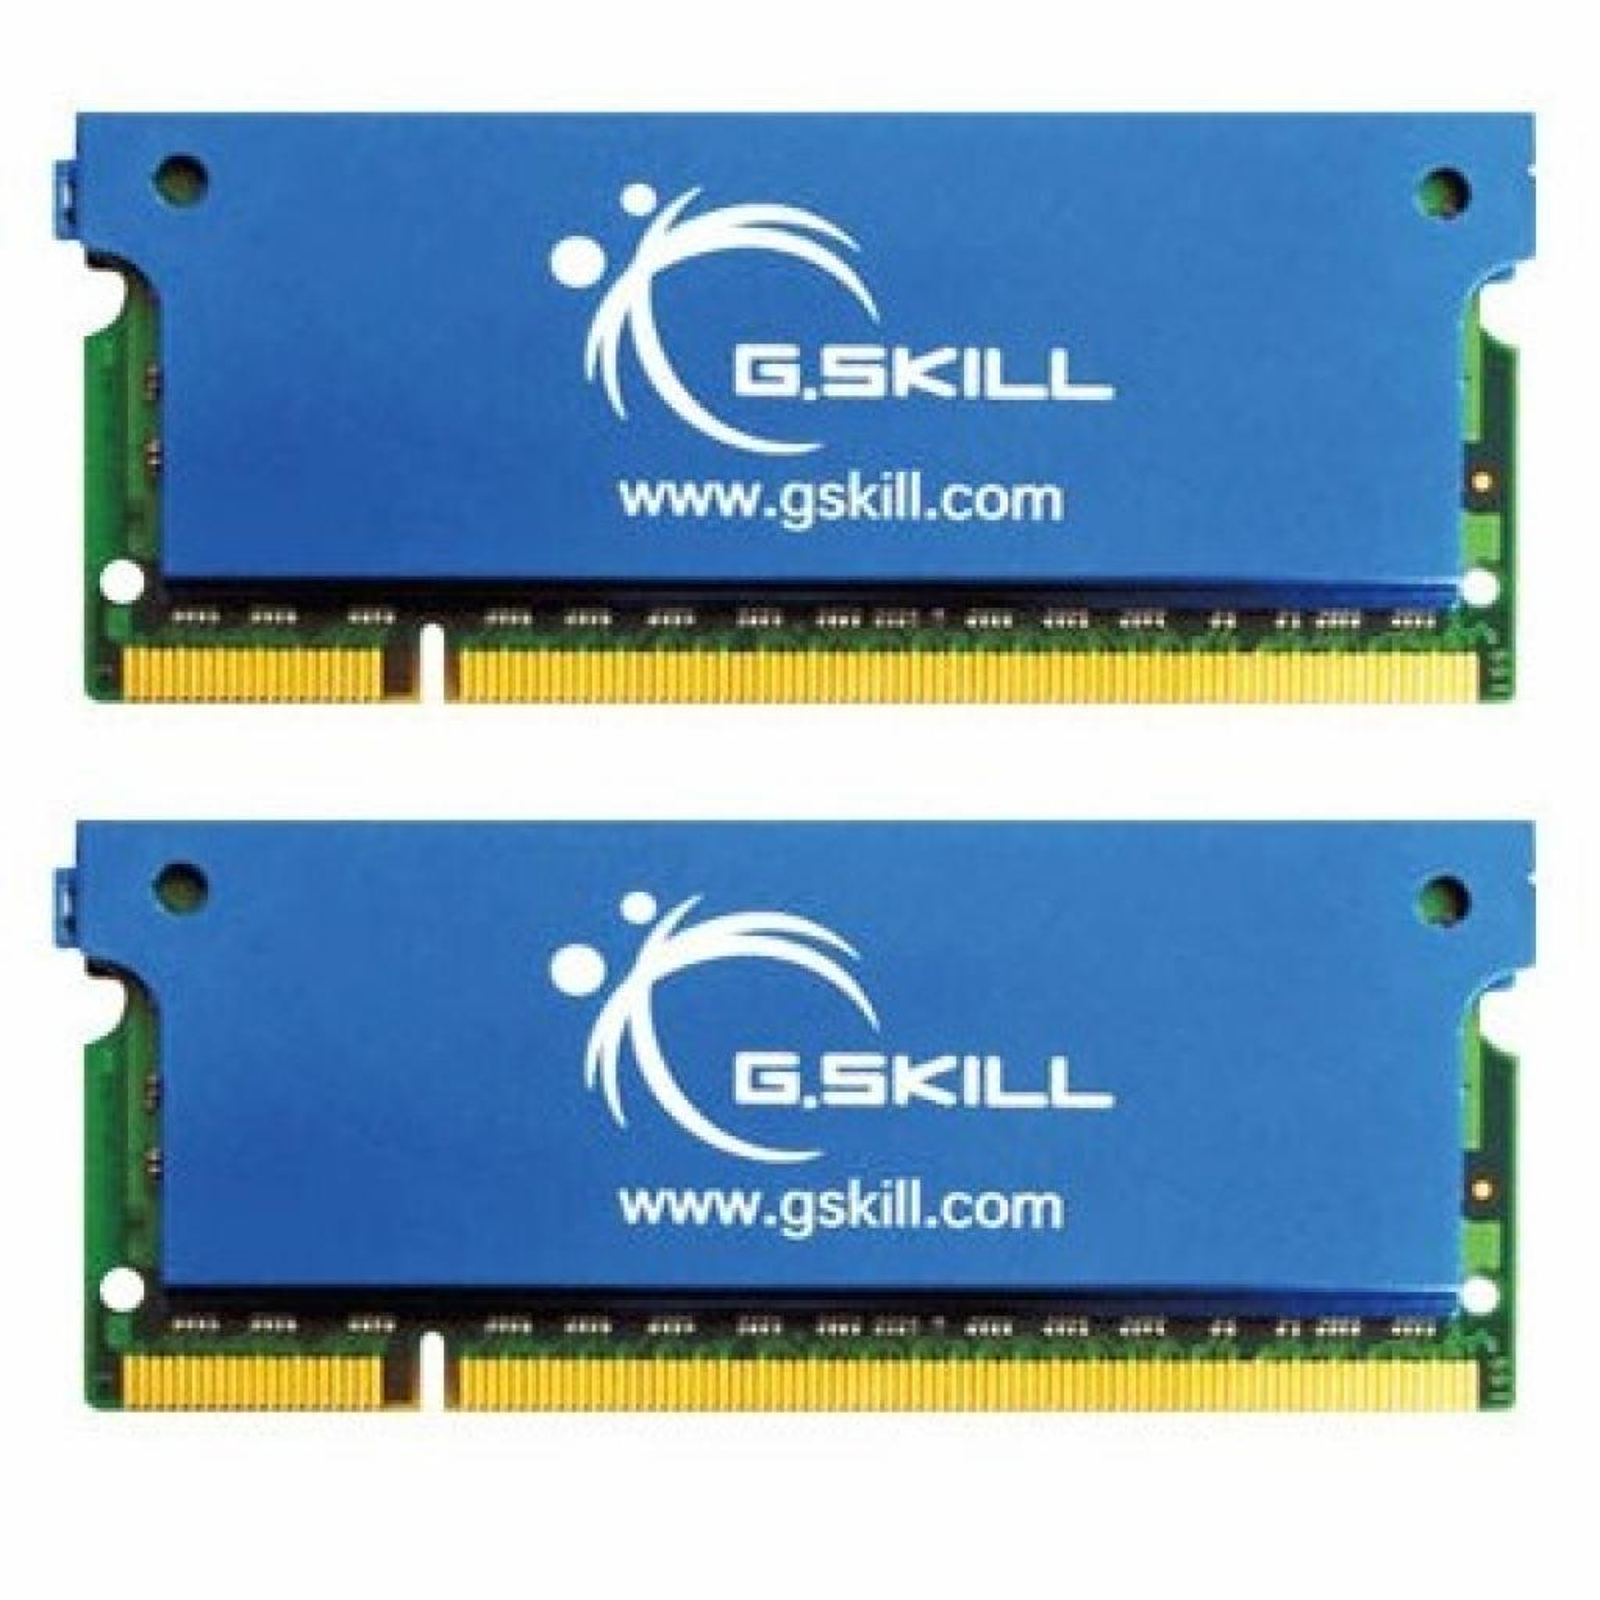 Модуль памяти для ноутбука SoDIMM DDR2 4GB(2x2GB) 667 MHz G.Skill (F2-5300CL5D-4GBSK)